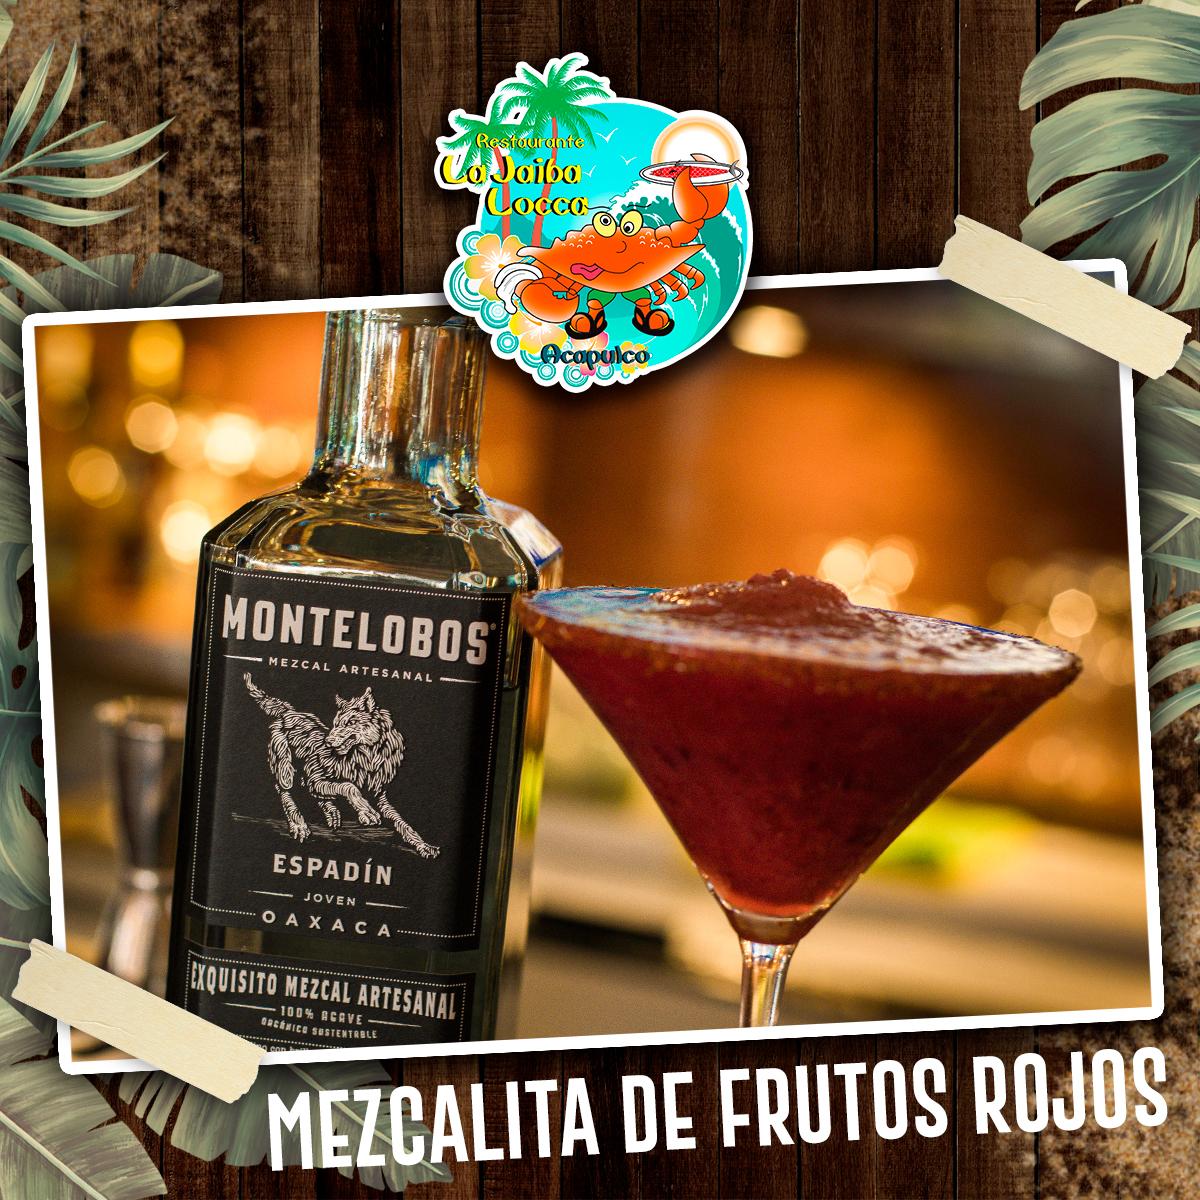 https://0201.nccdn.net/1_2/000/000/0b5/32b/mezcalita-de-frutos-rojos.jpg